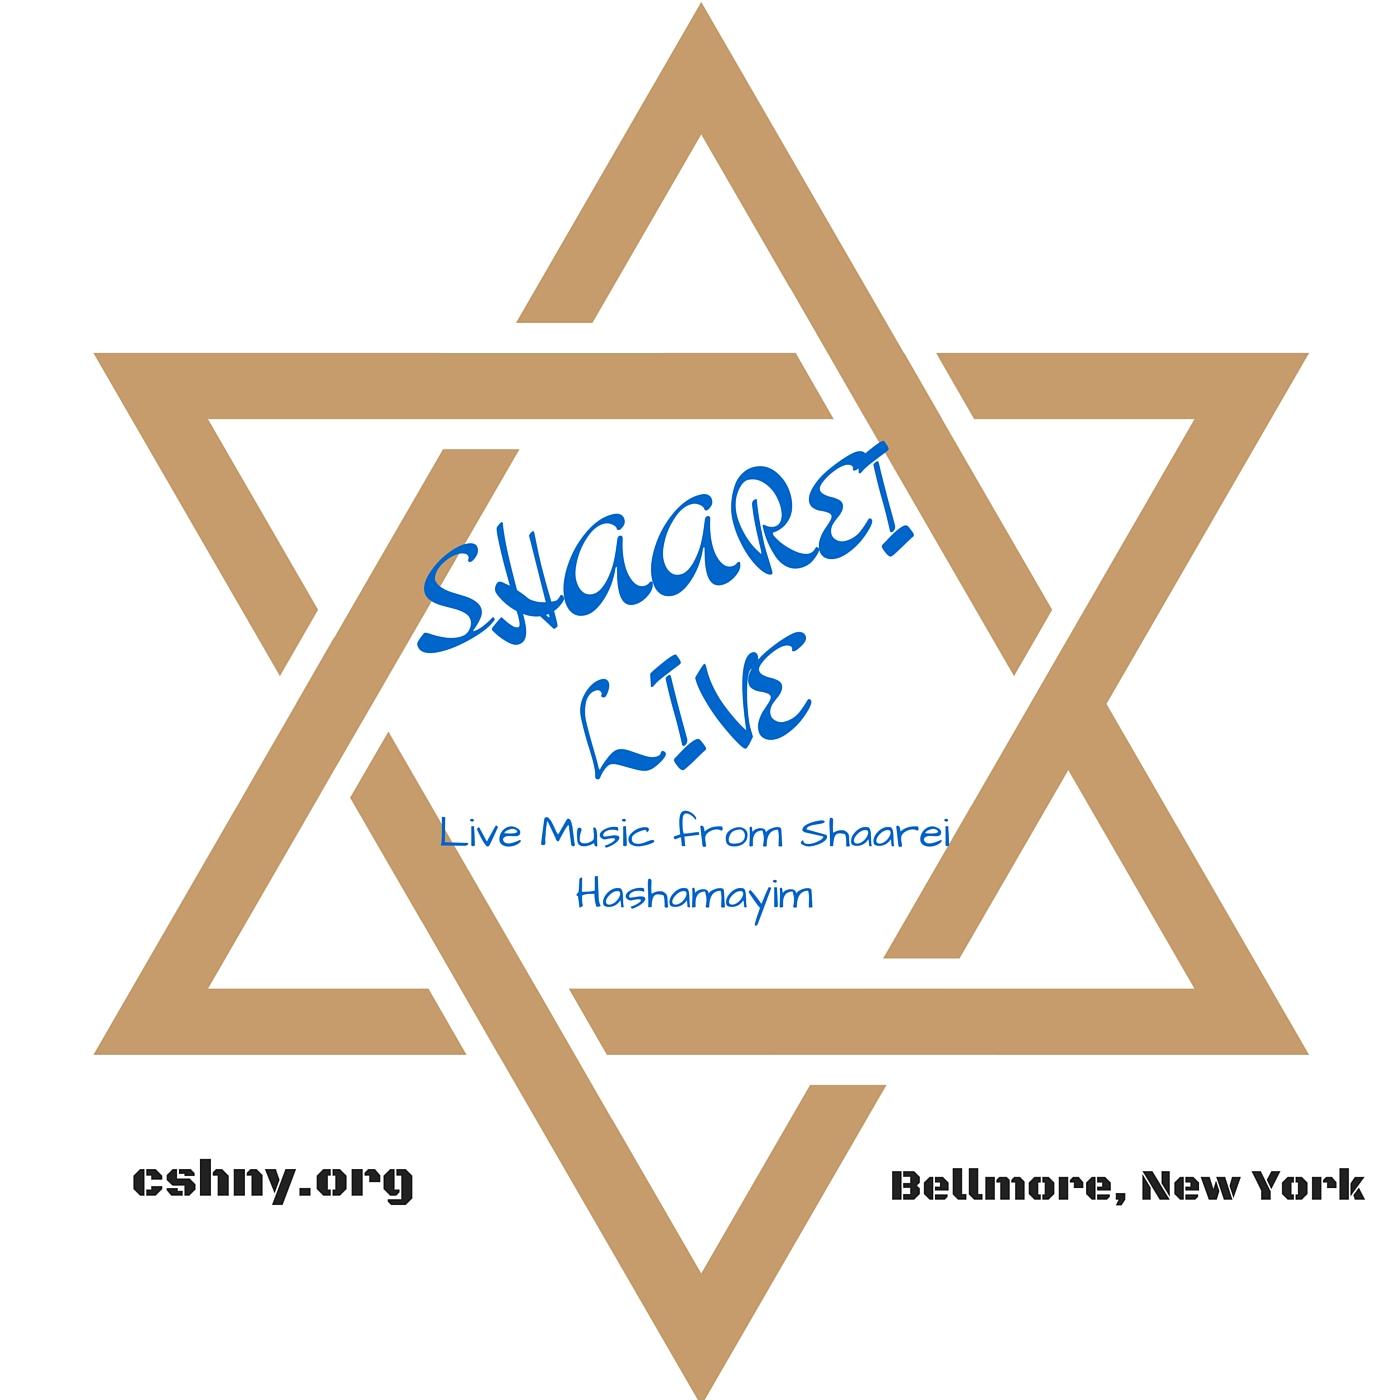 Shaarei Live